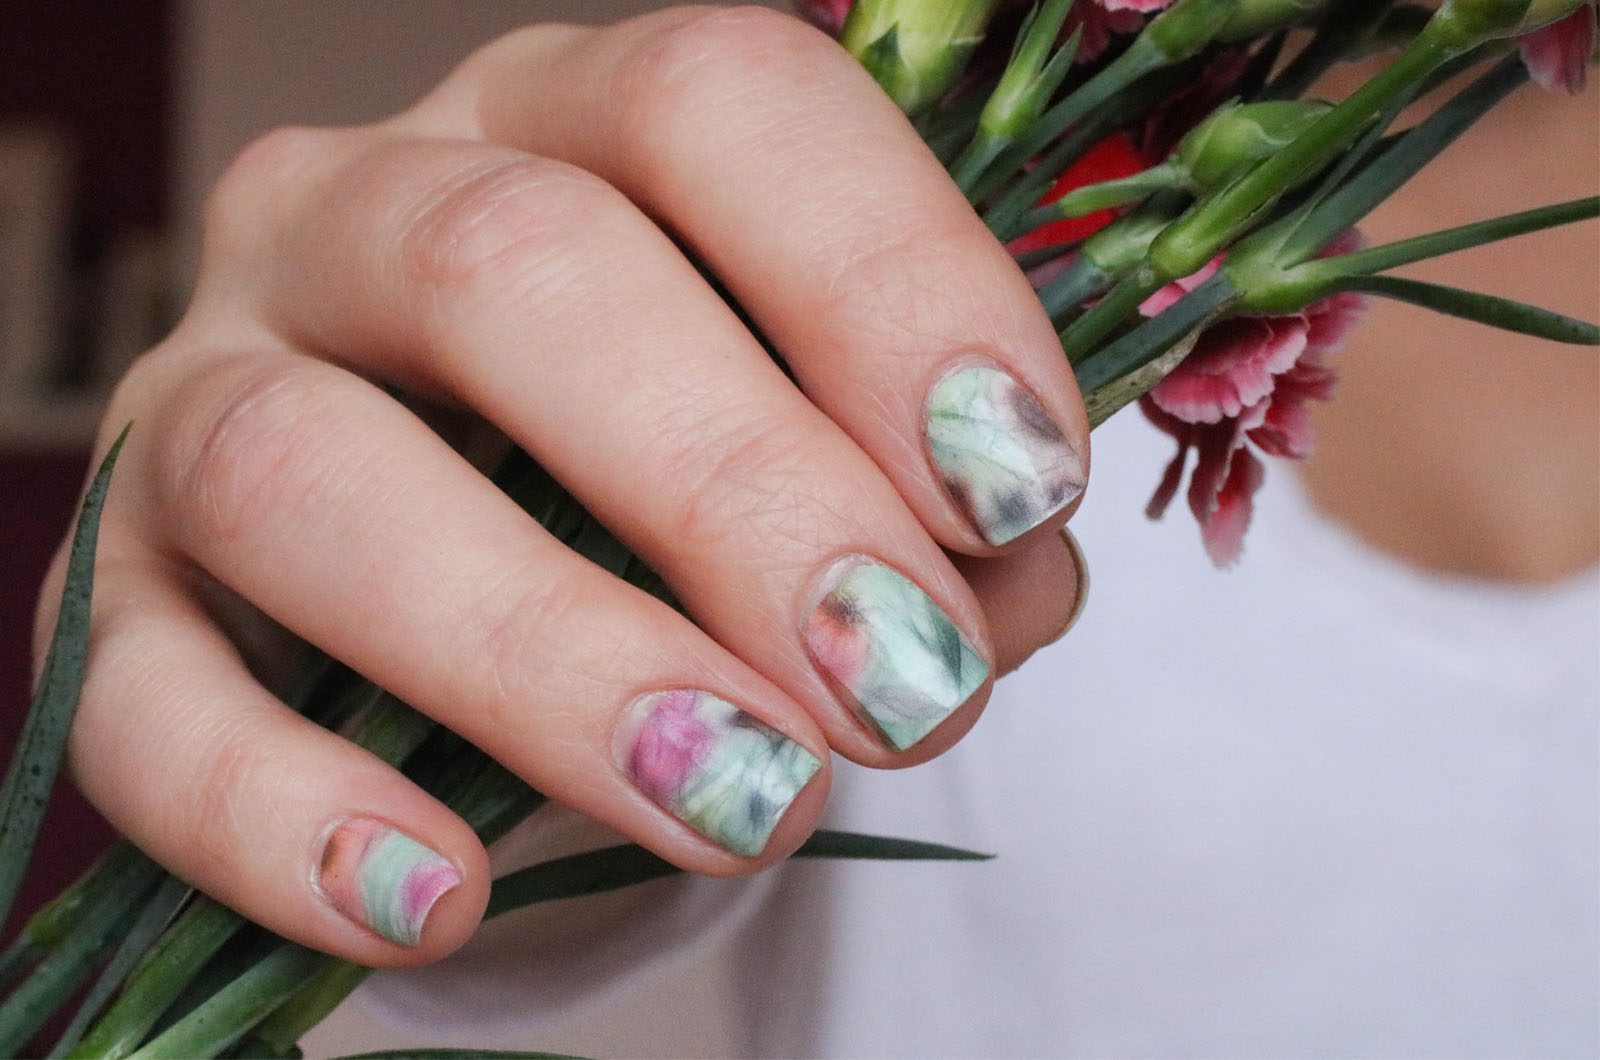 BEAUTY] Nail Art Water Decal - lovelycatification